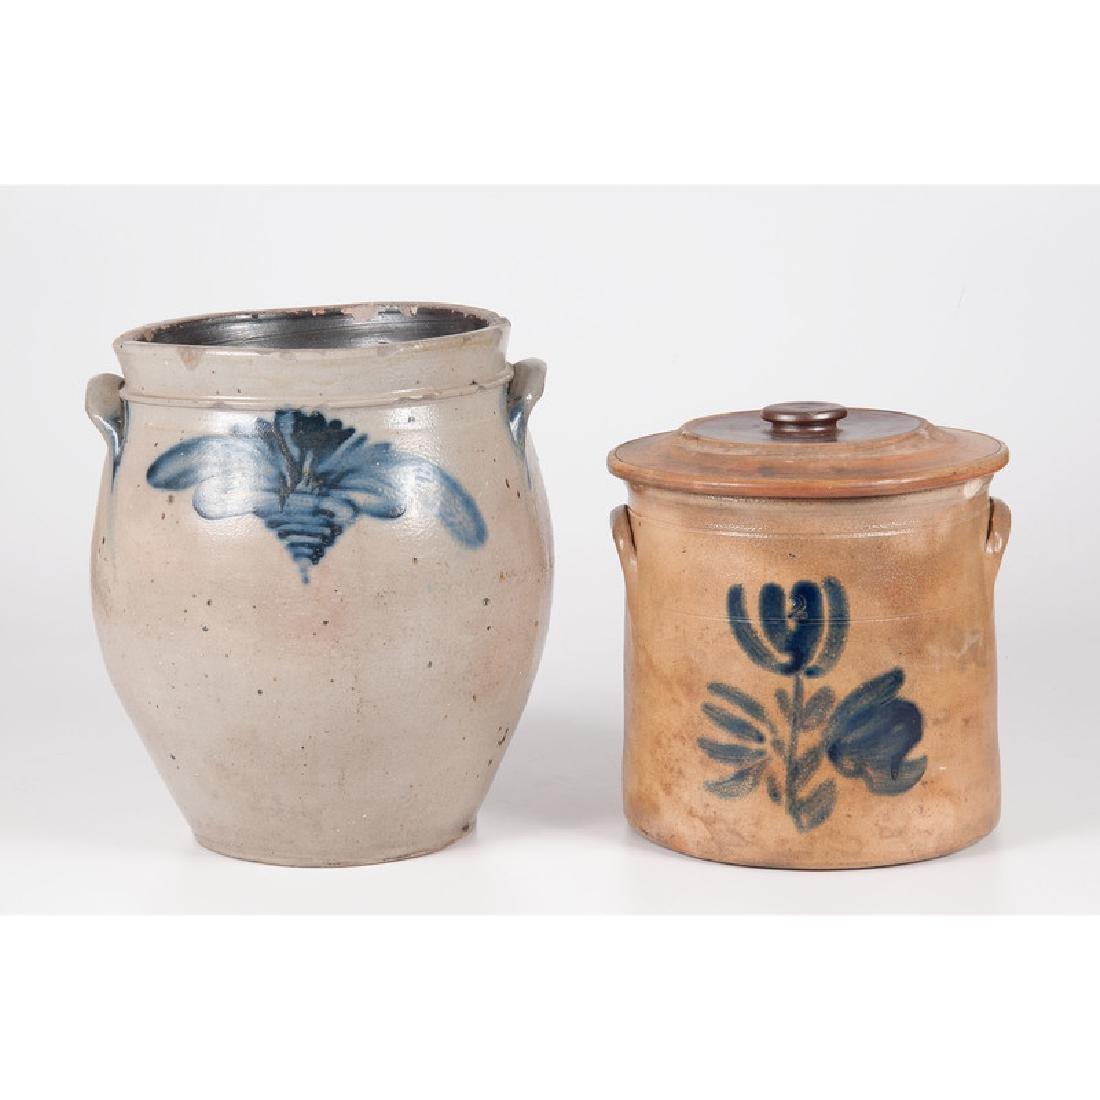 Stoneware Crocks with Cobalt Floral Decoration